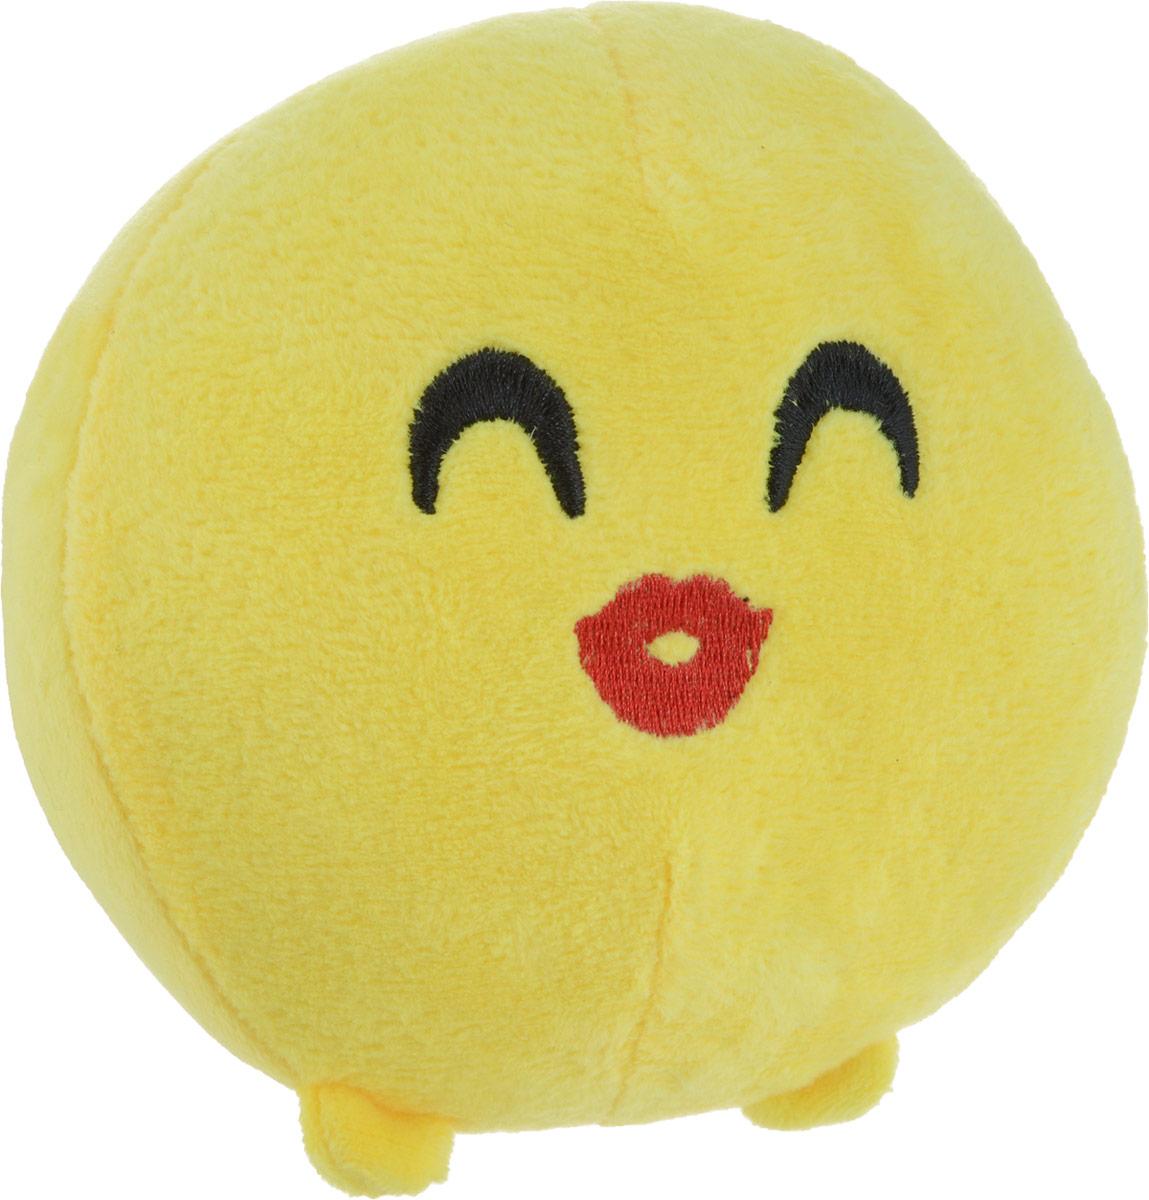 Imoji Мягкая игрушка 12 см 40051 imoji мягкая игрушка 12 см 41059